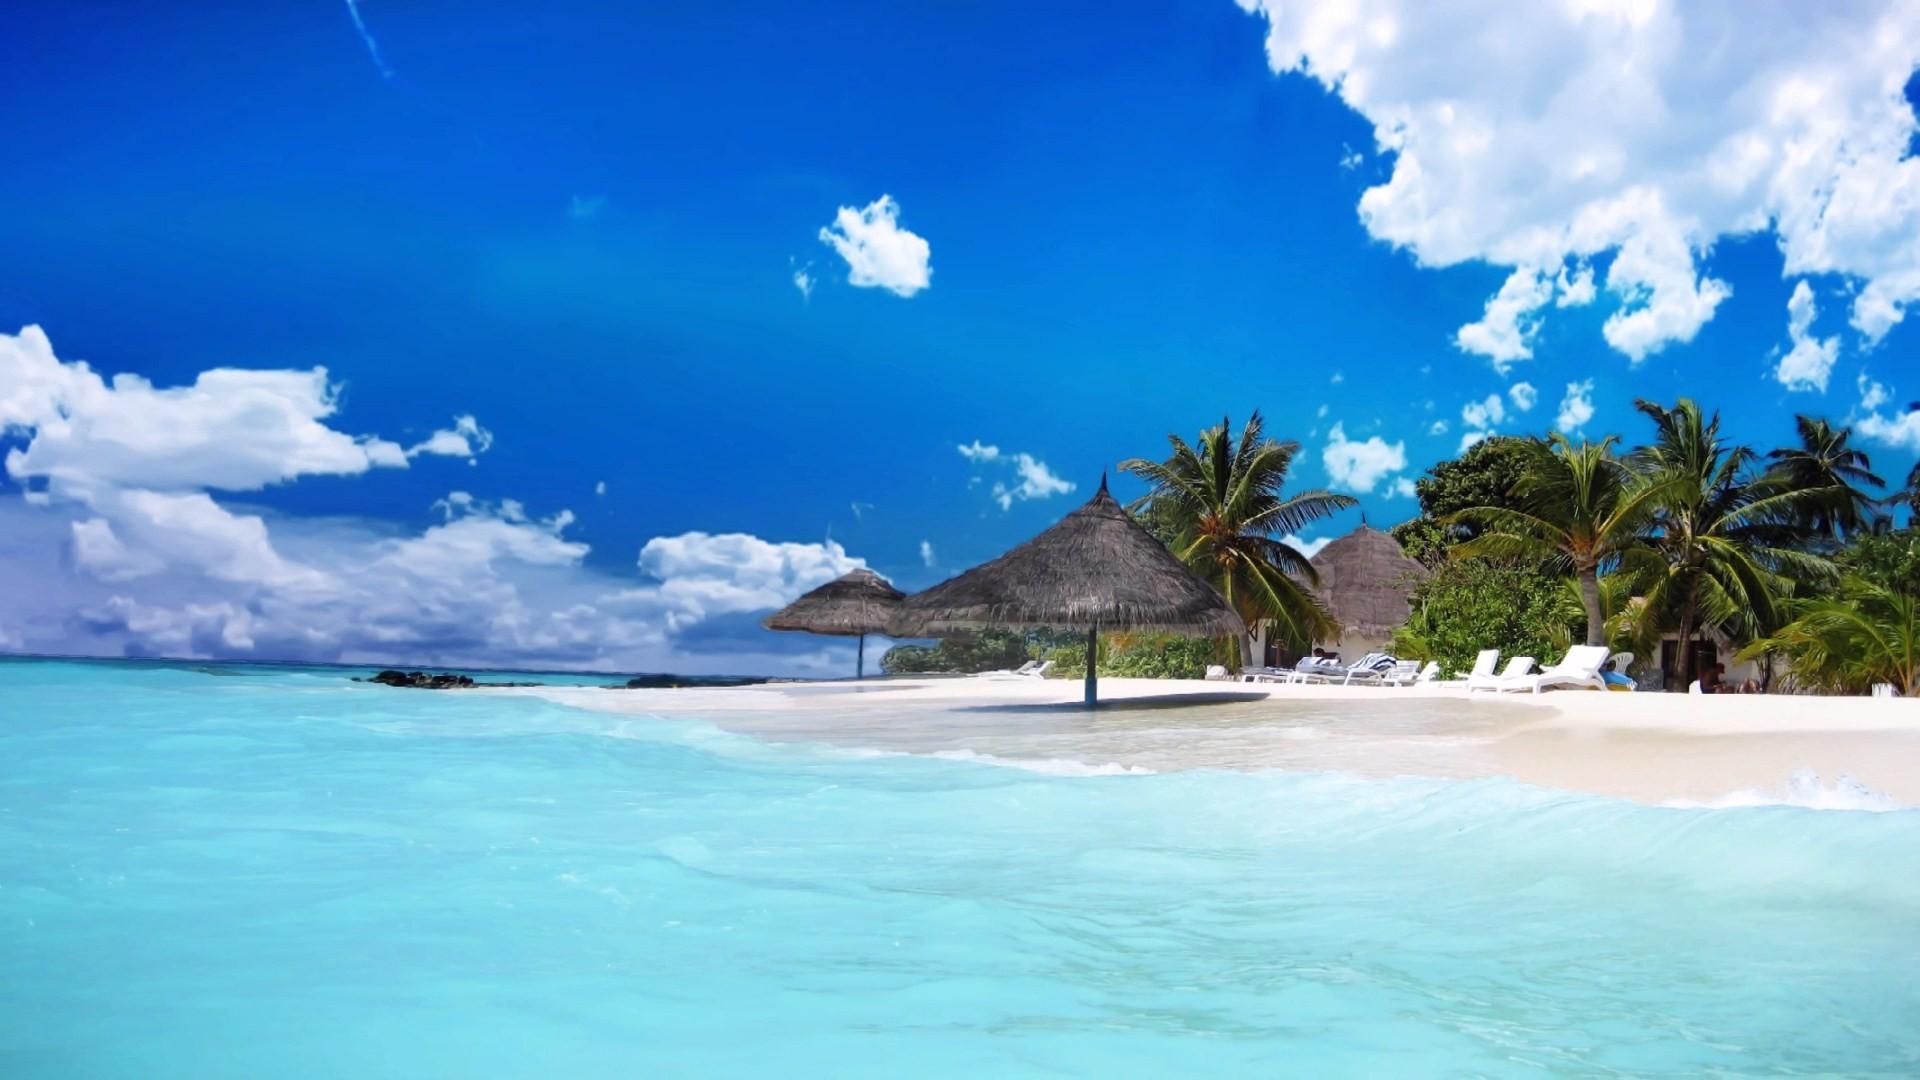 beach pictures wallpaper,tropics,nature,caribbean,natural landscape,sky